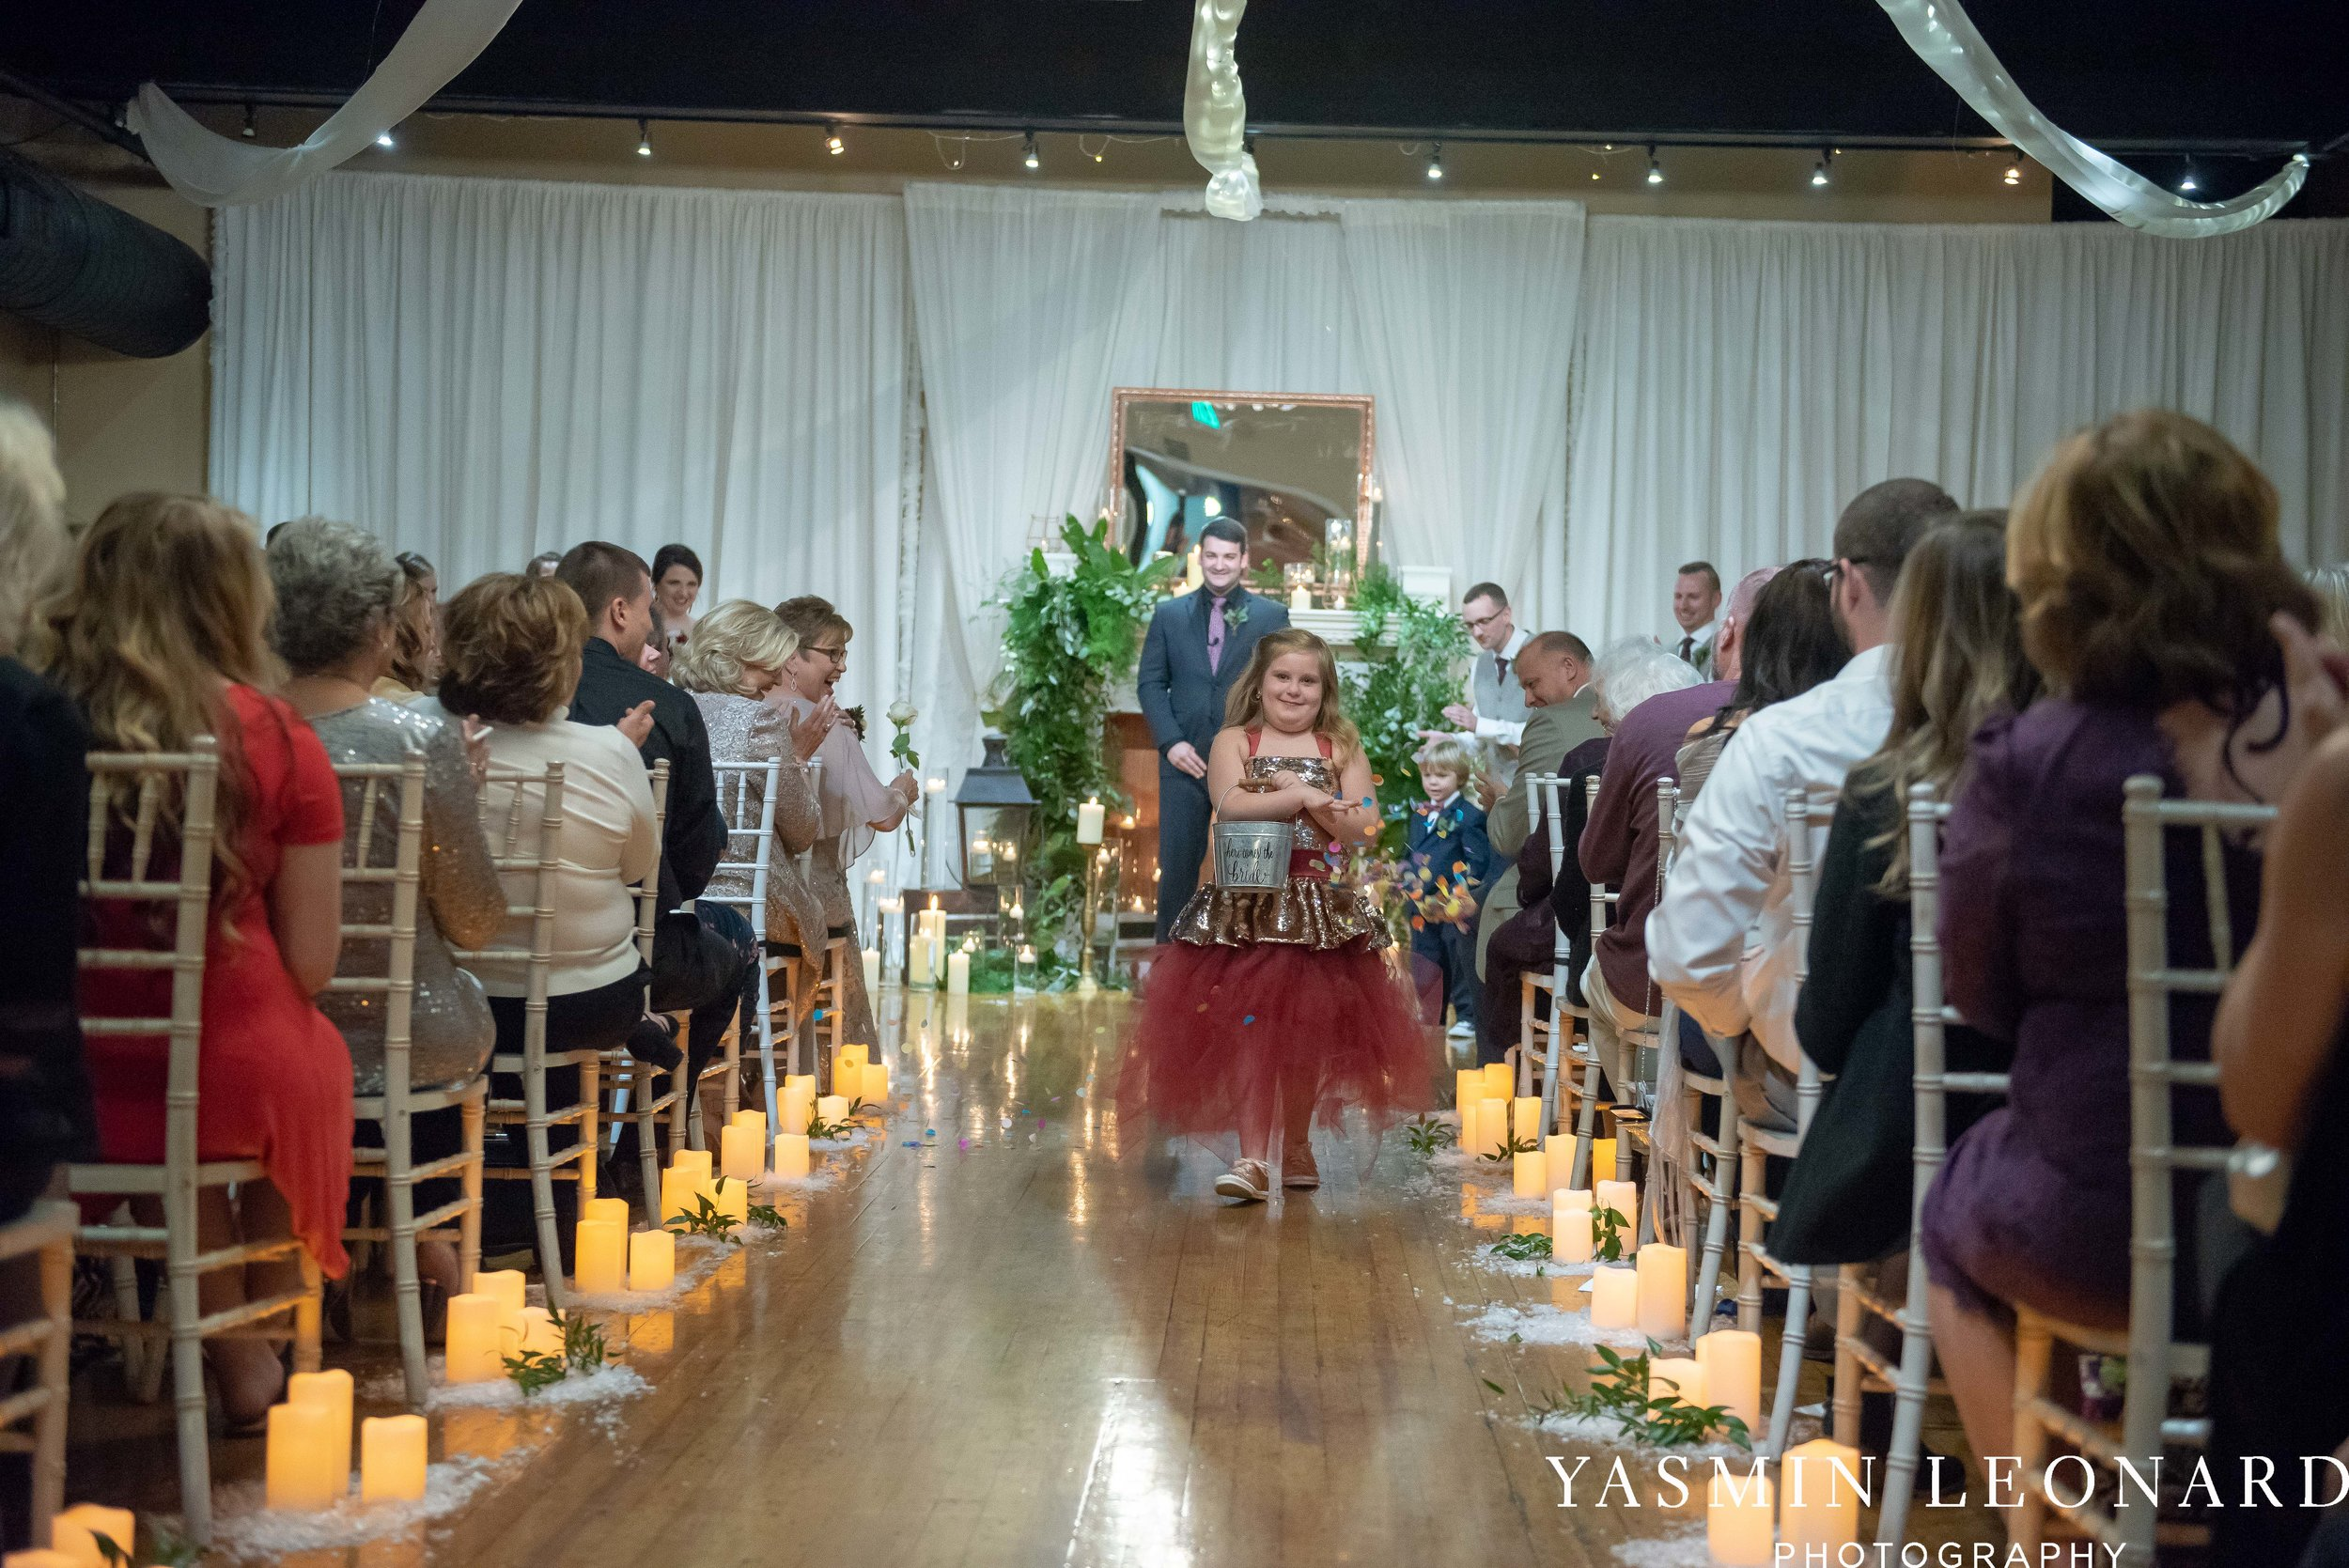 Rebekah and Matt - 105 Worth Event Centre - Yasmin Leonard Photography - Asheboro Wedding - NC Wedding - High Point Weddings - Triad Weddings - Winter Wedding-32.jpg